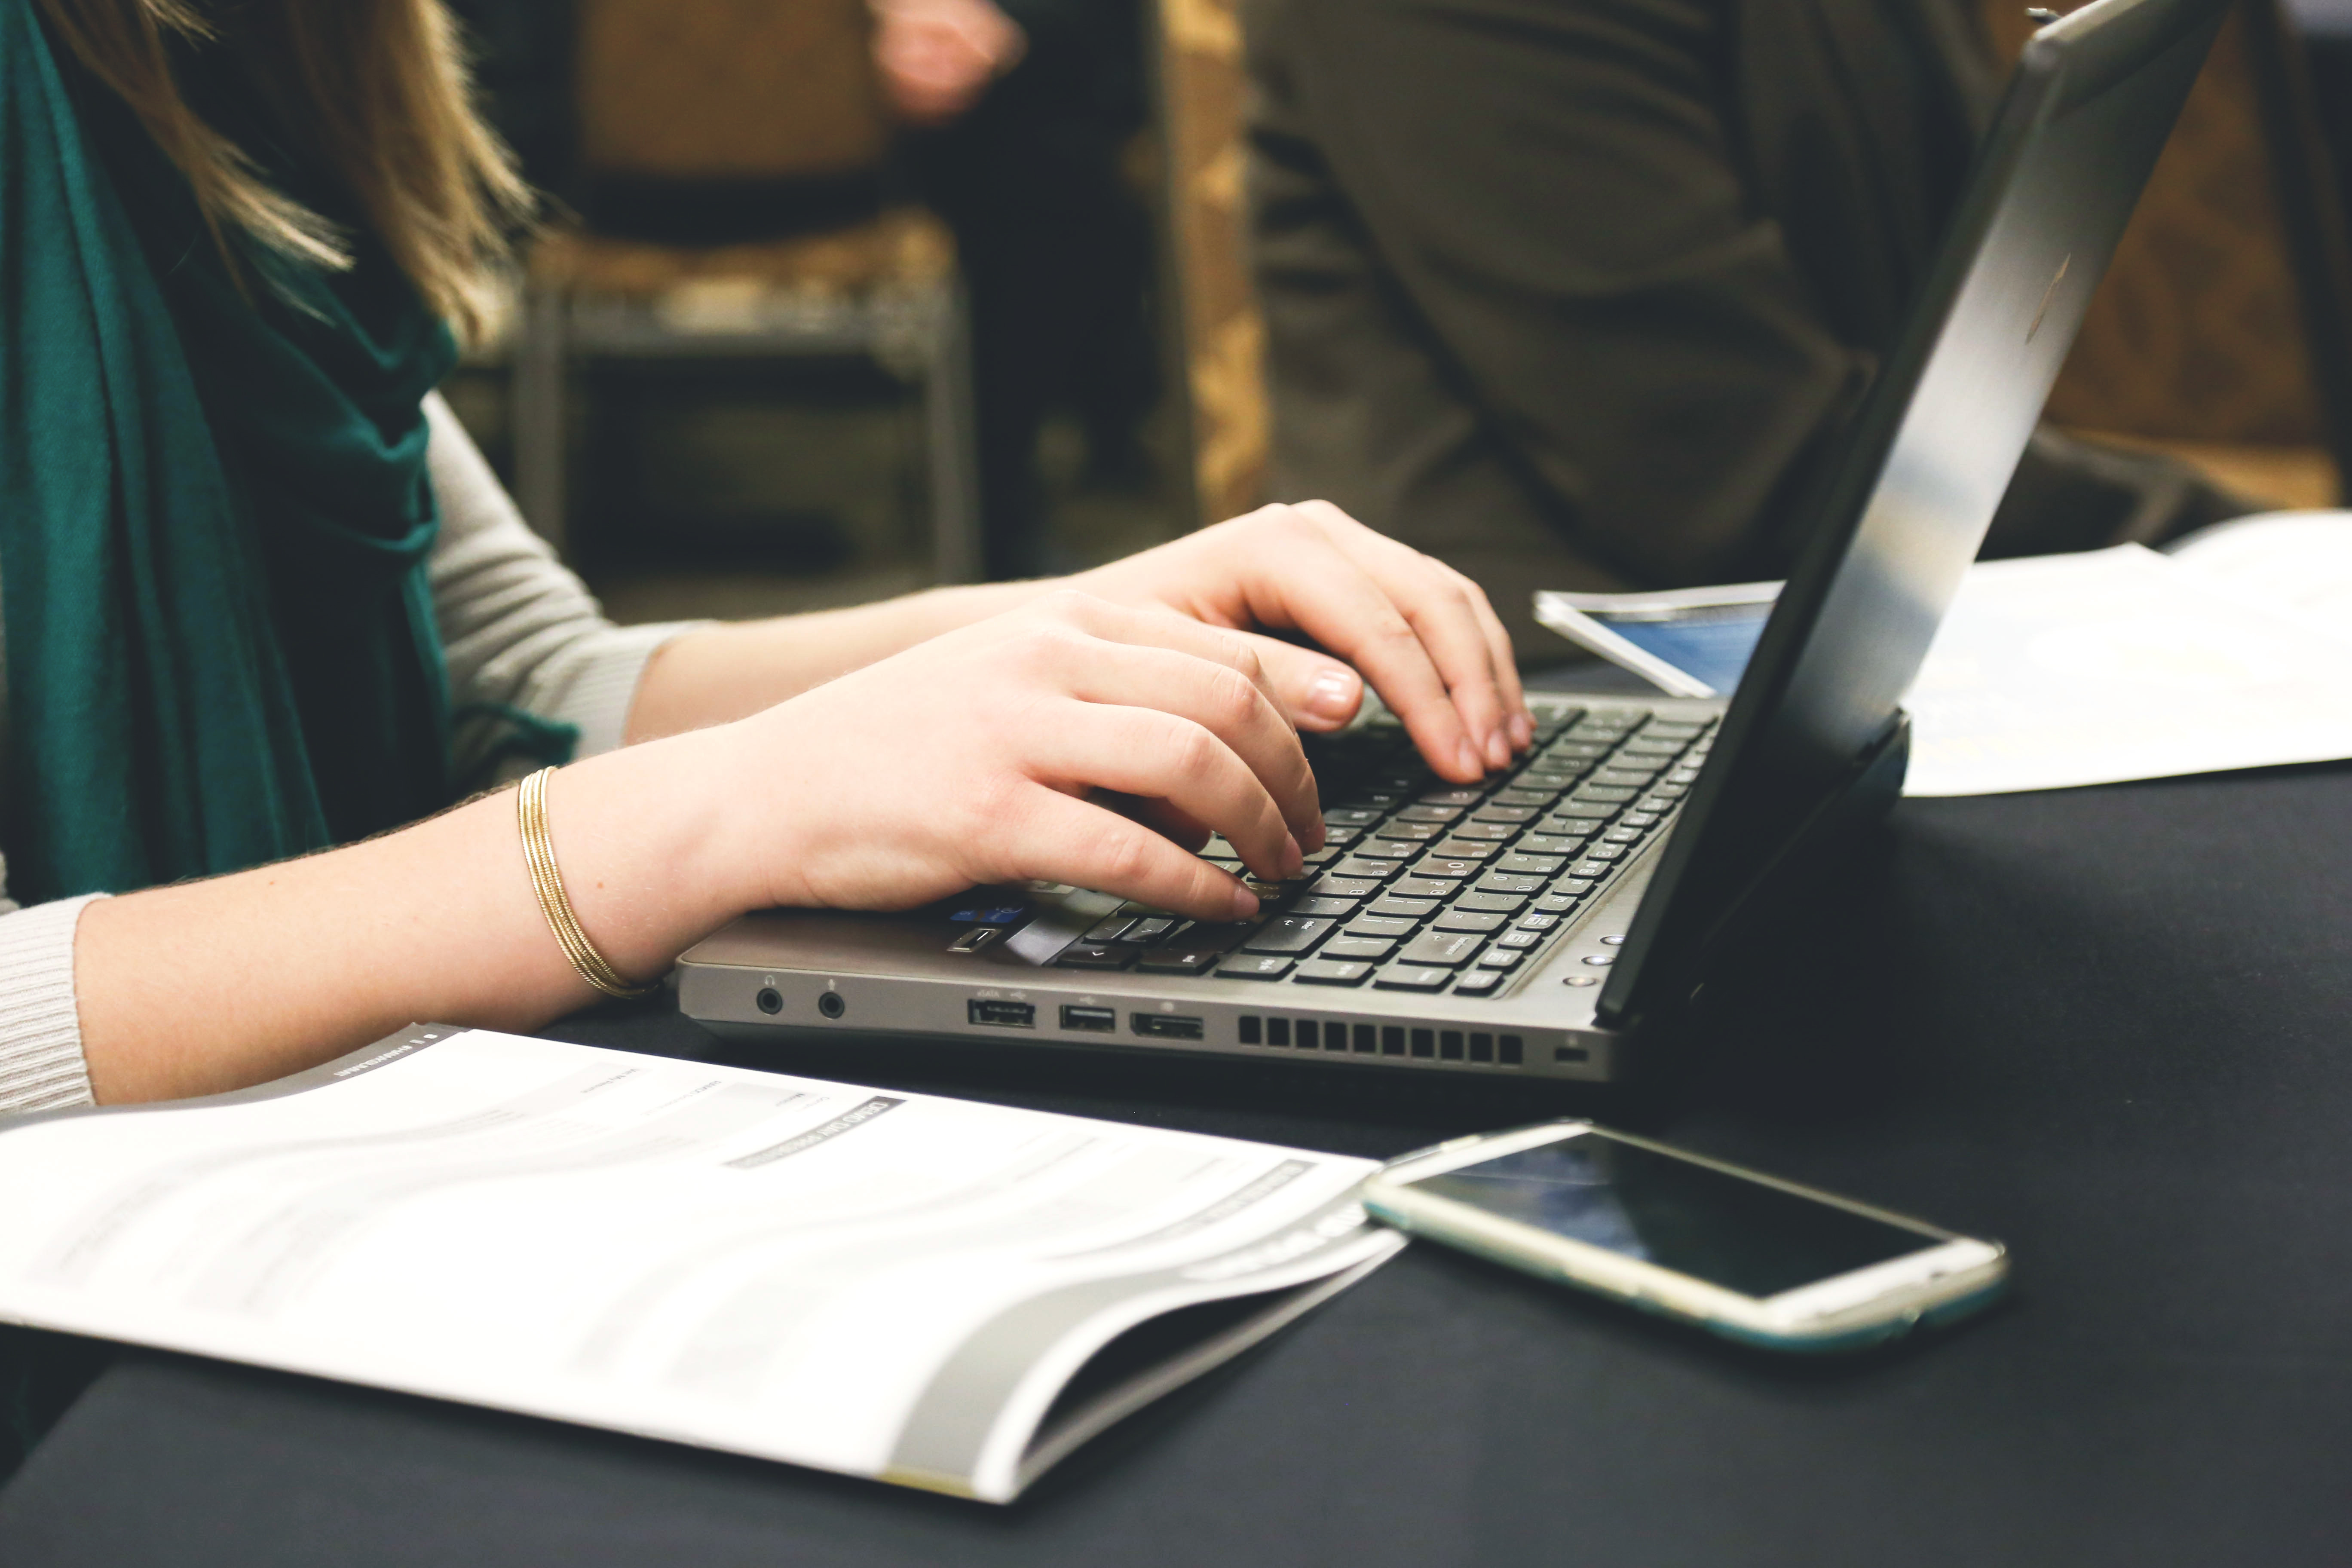 Steuererklärung vorbereiten: 5 Tipps gegen den Abgabestress